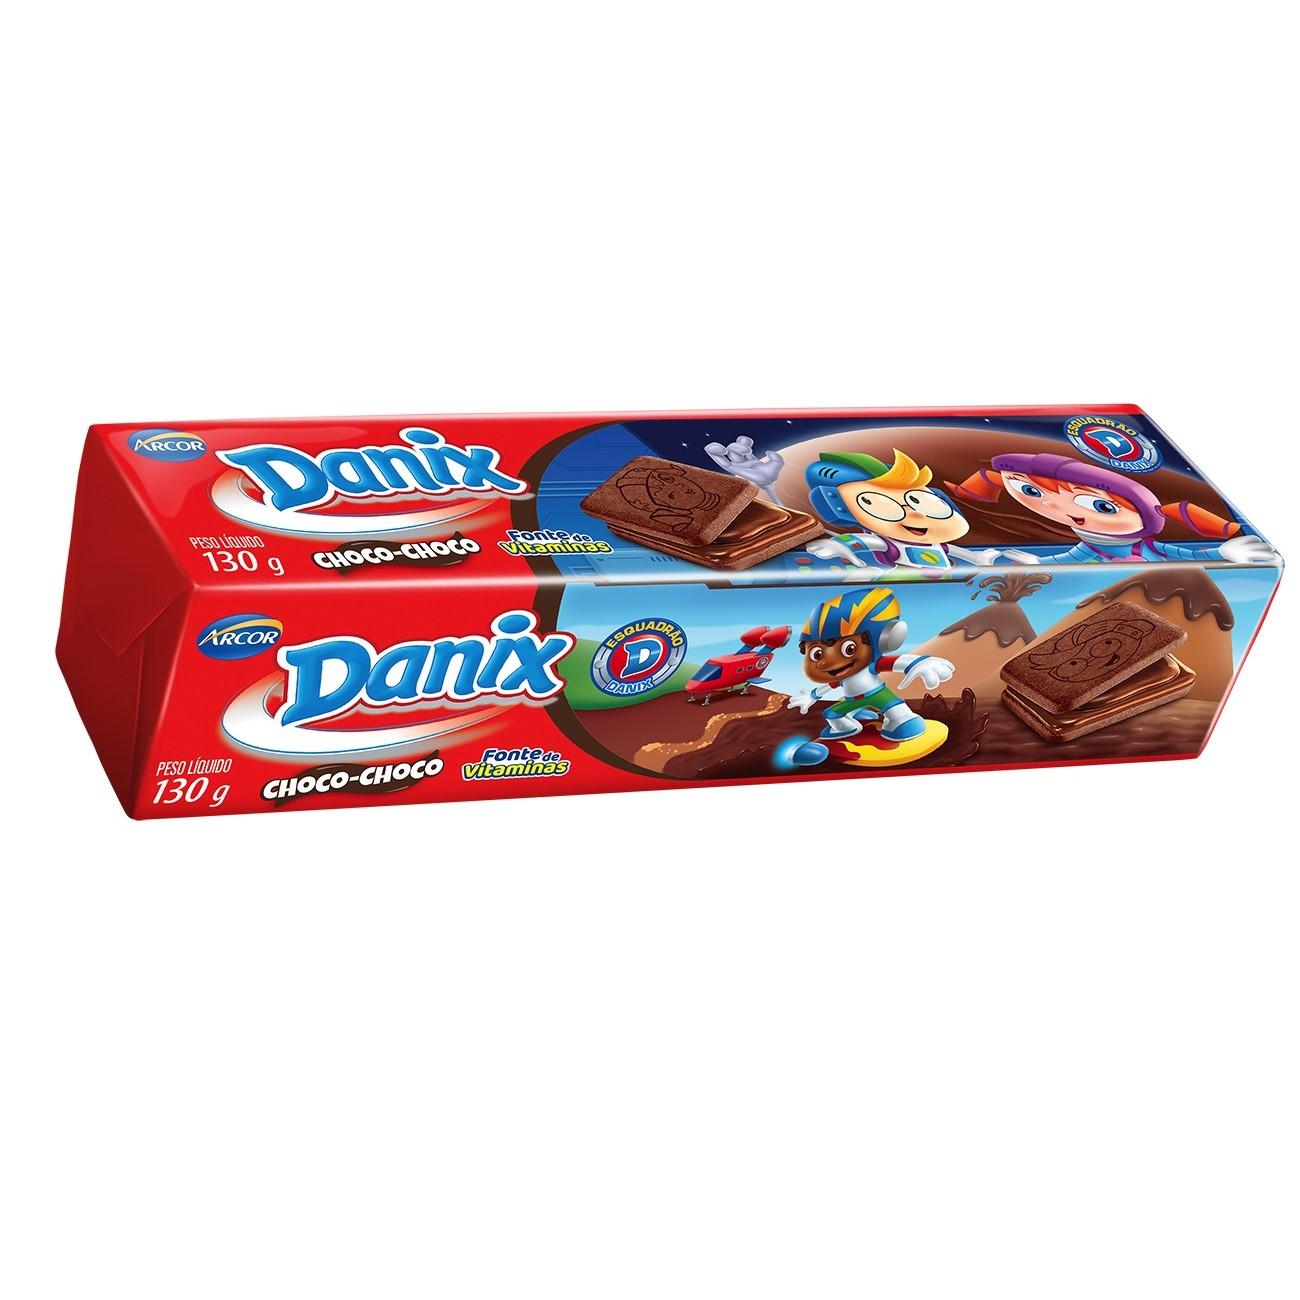 Biscoito Danix Recheado Choco Choco Patrulha Canina 130g